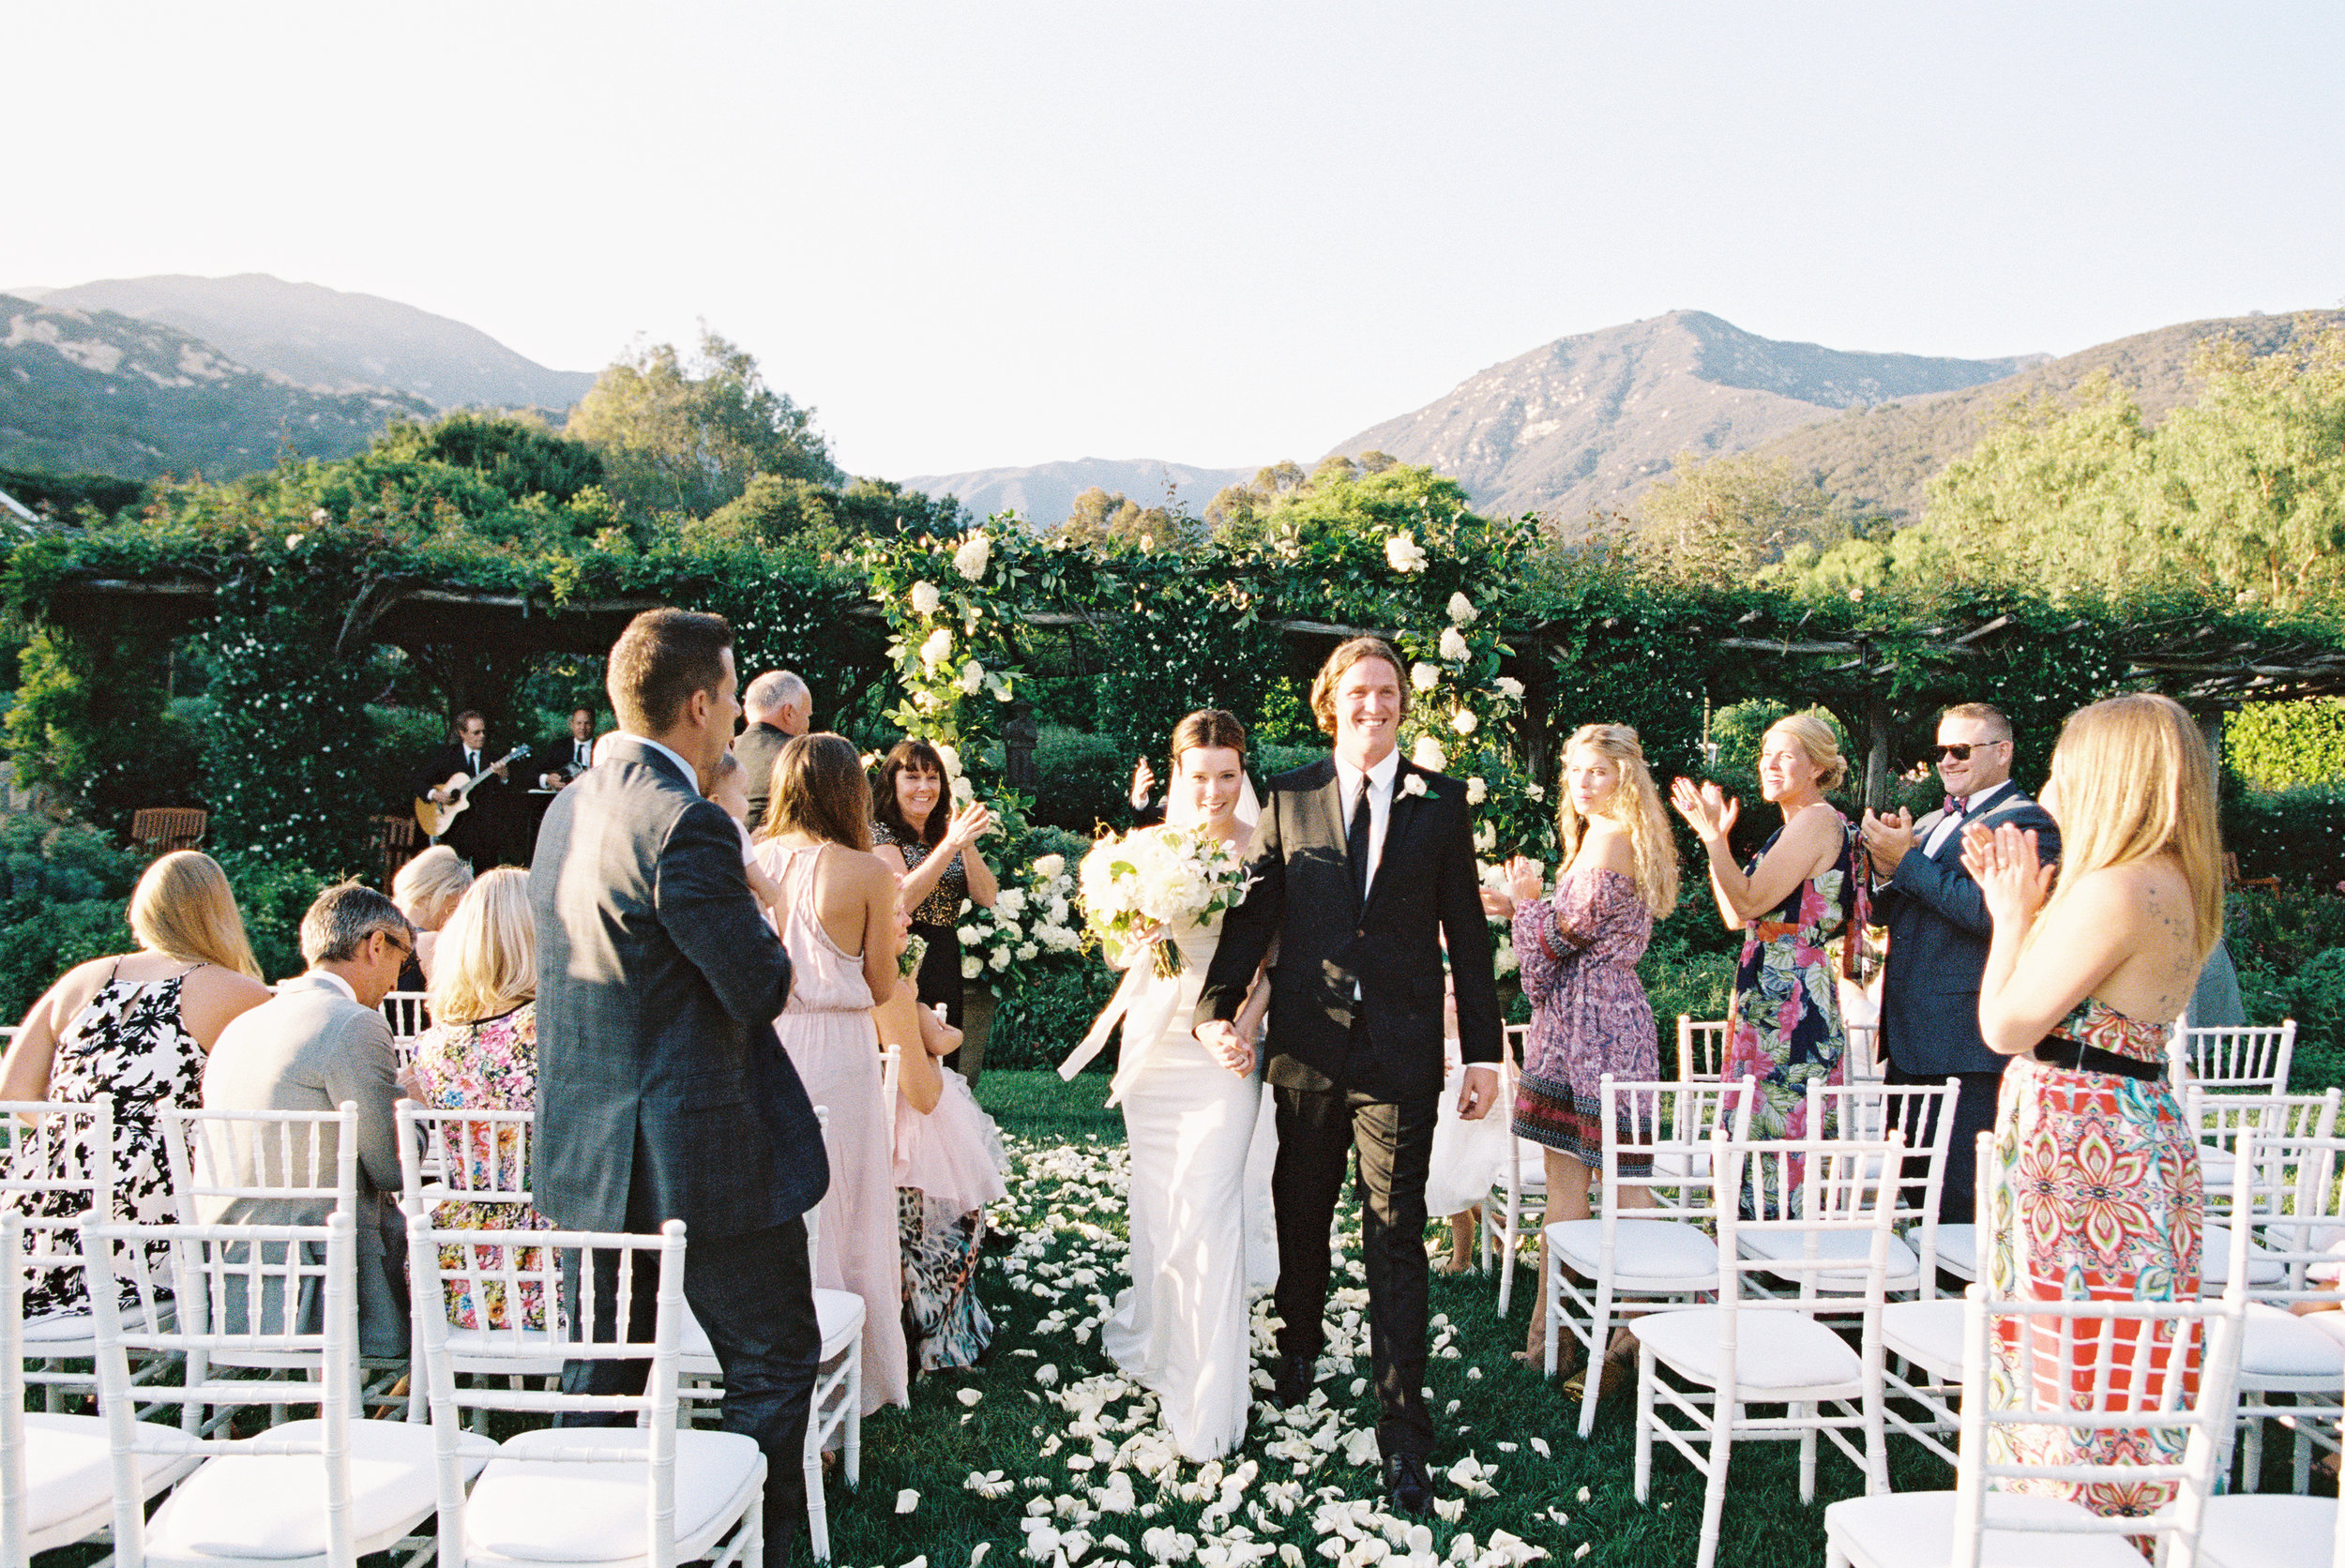 www.santabarbarawedding.com | San Ysidro Ranch | Pat Moyer Photography | Ceremony